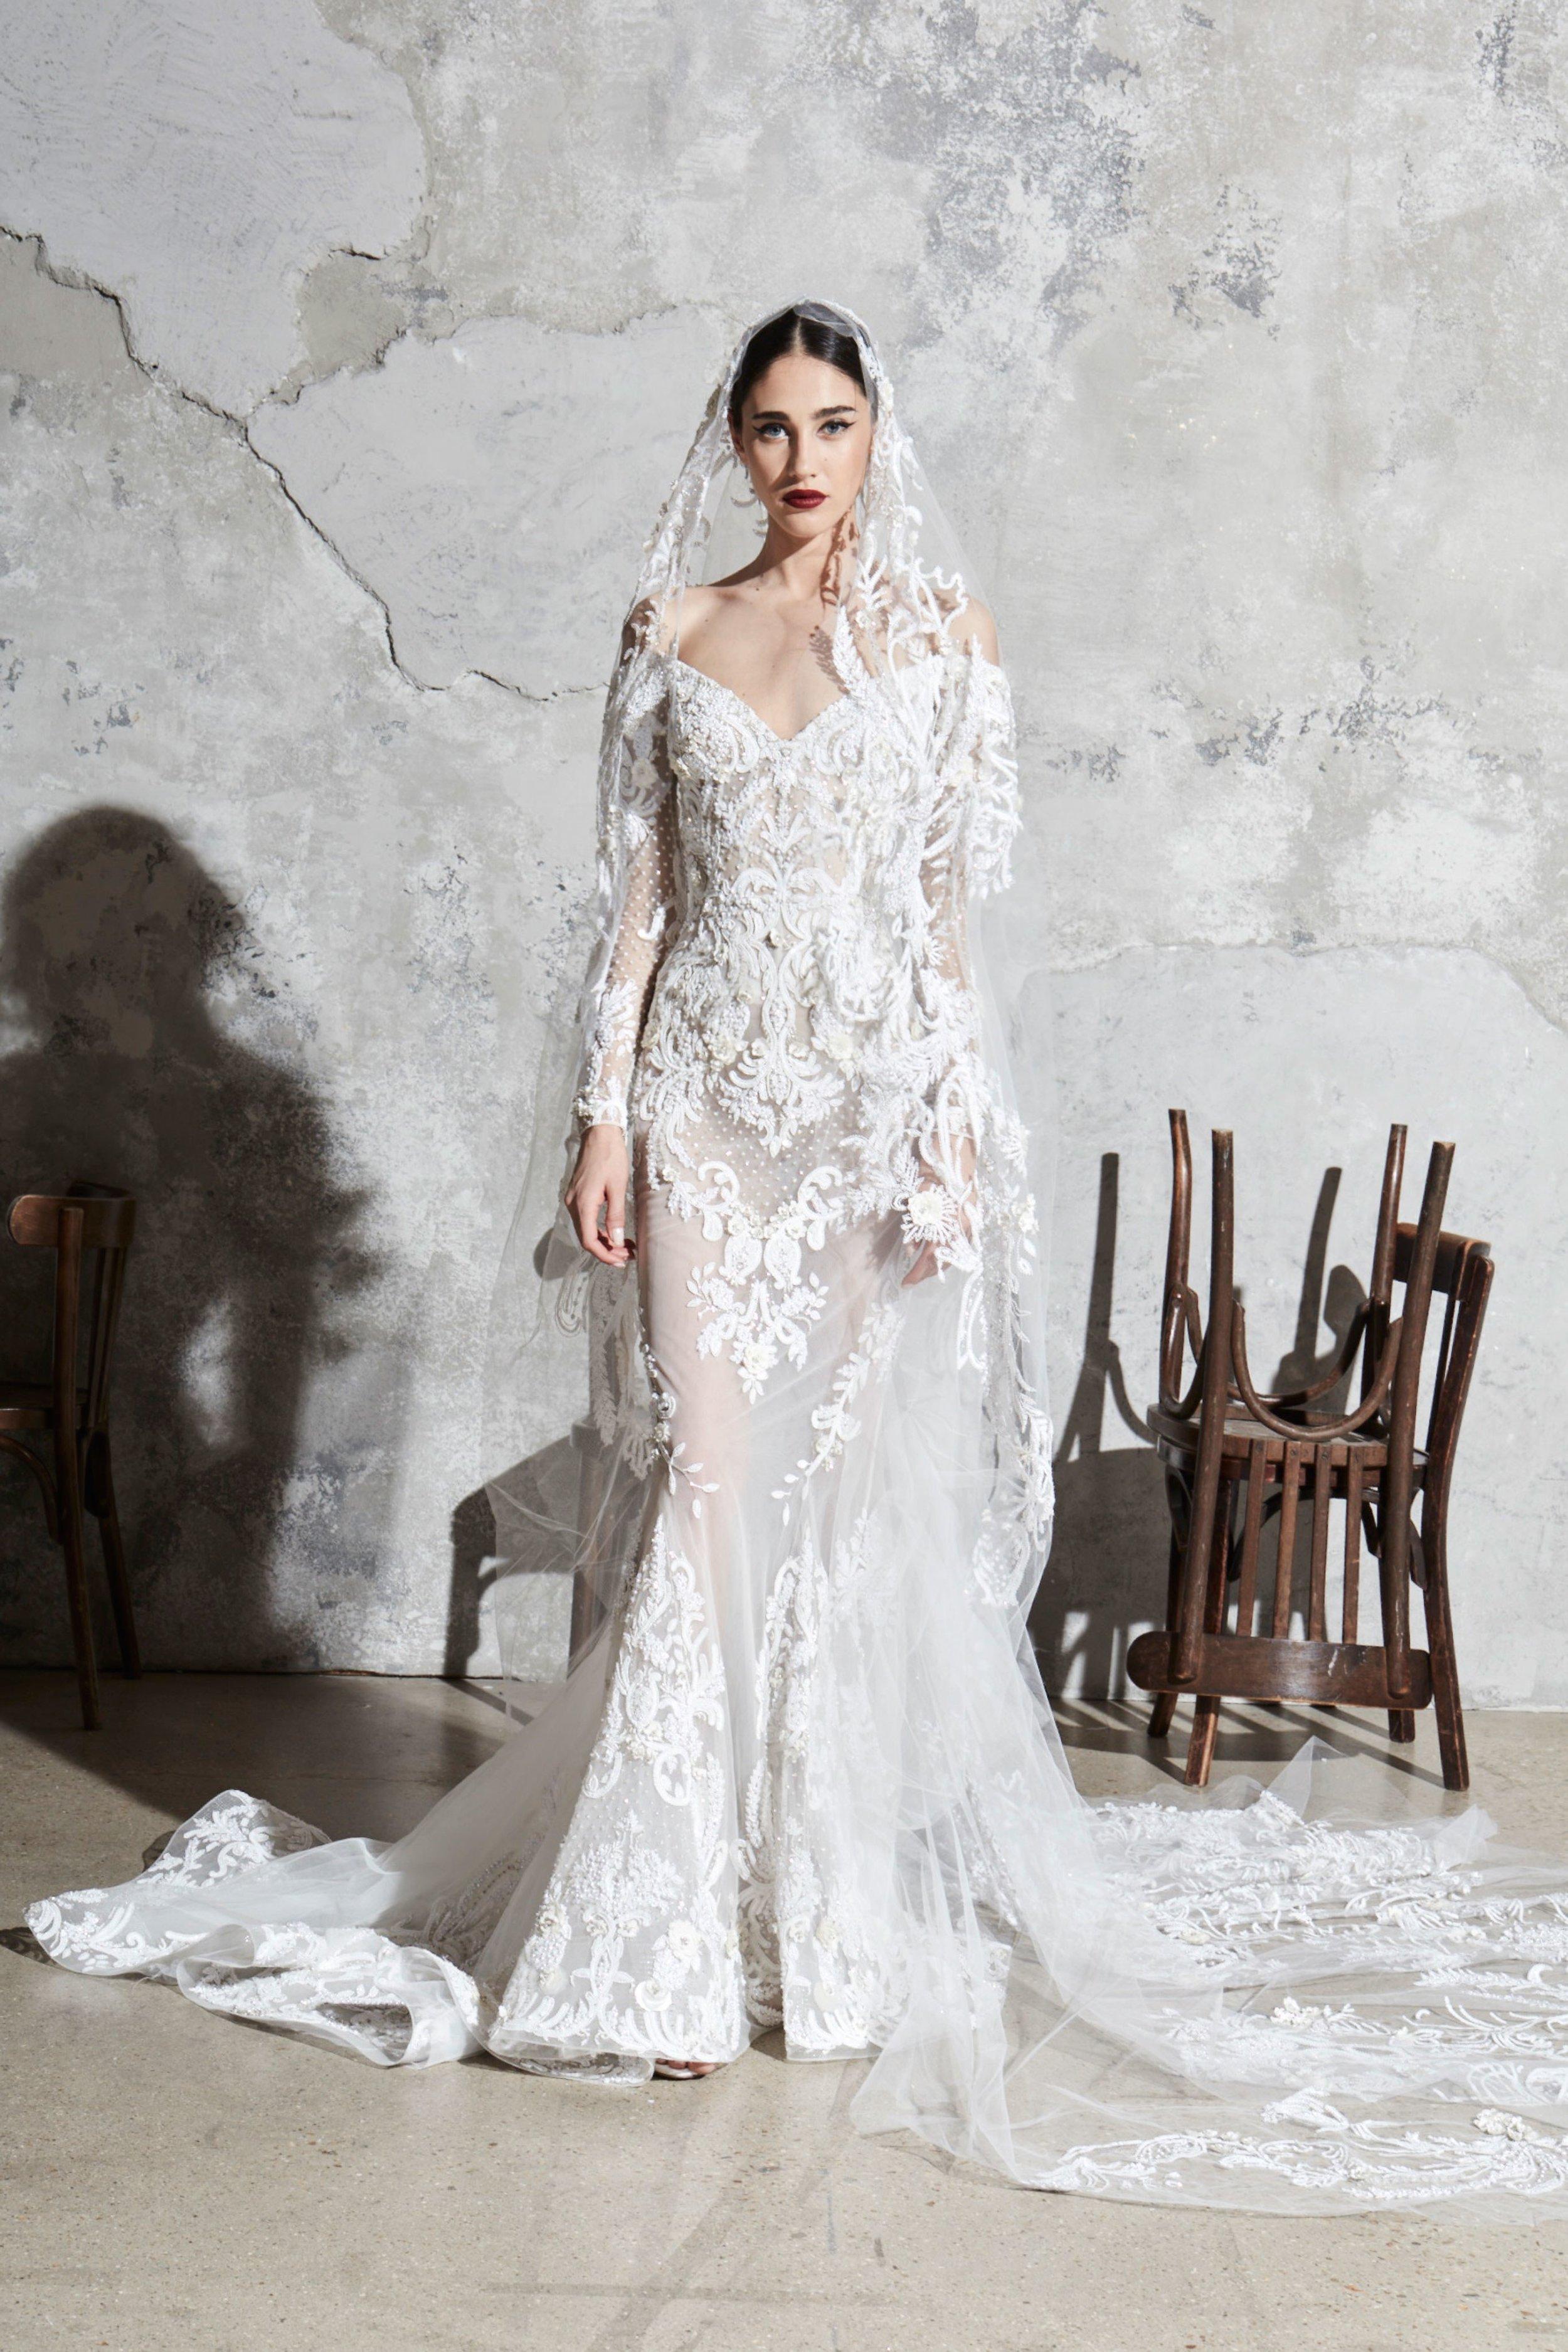 00021-zuhair-murad-new-york-bridal-Spring-2020-CREDIT-Thomas-Nutzl.jpg